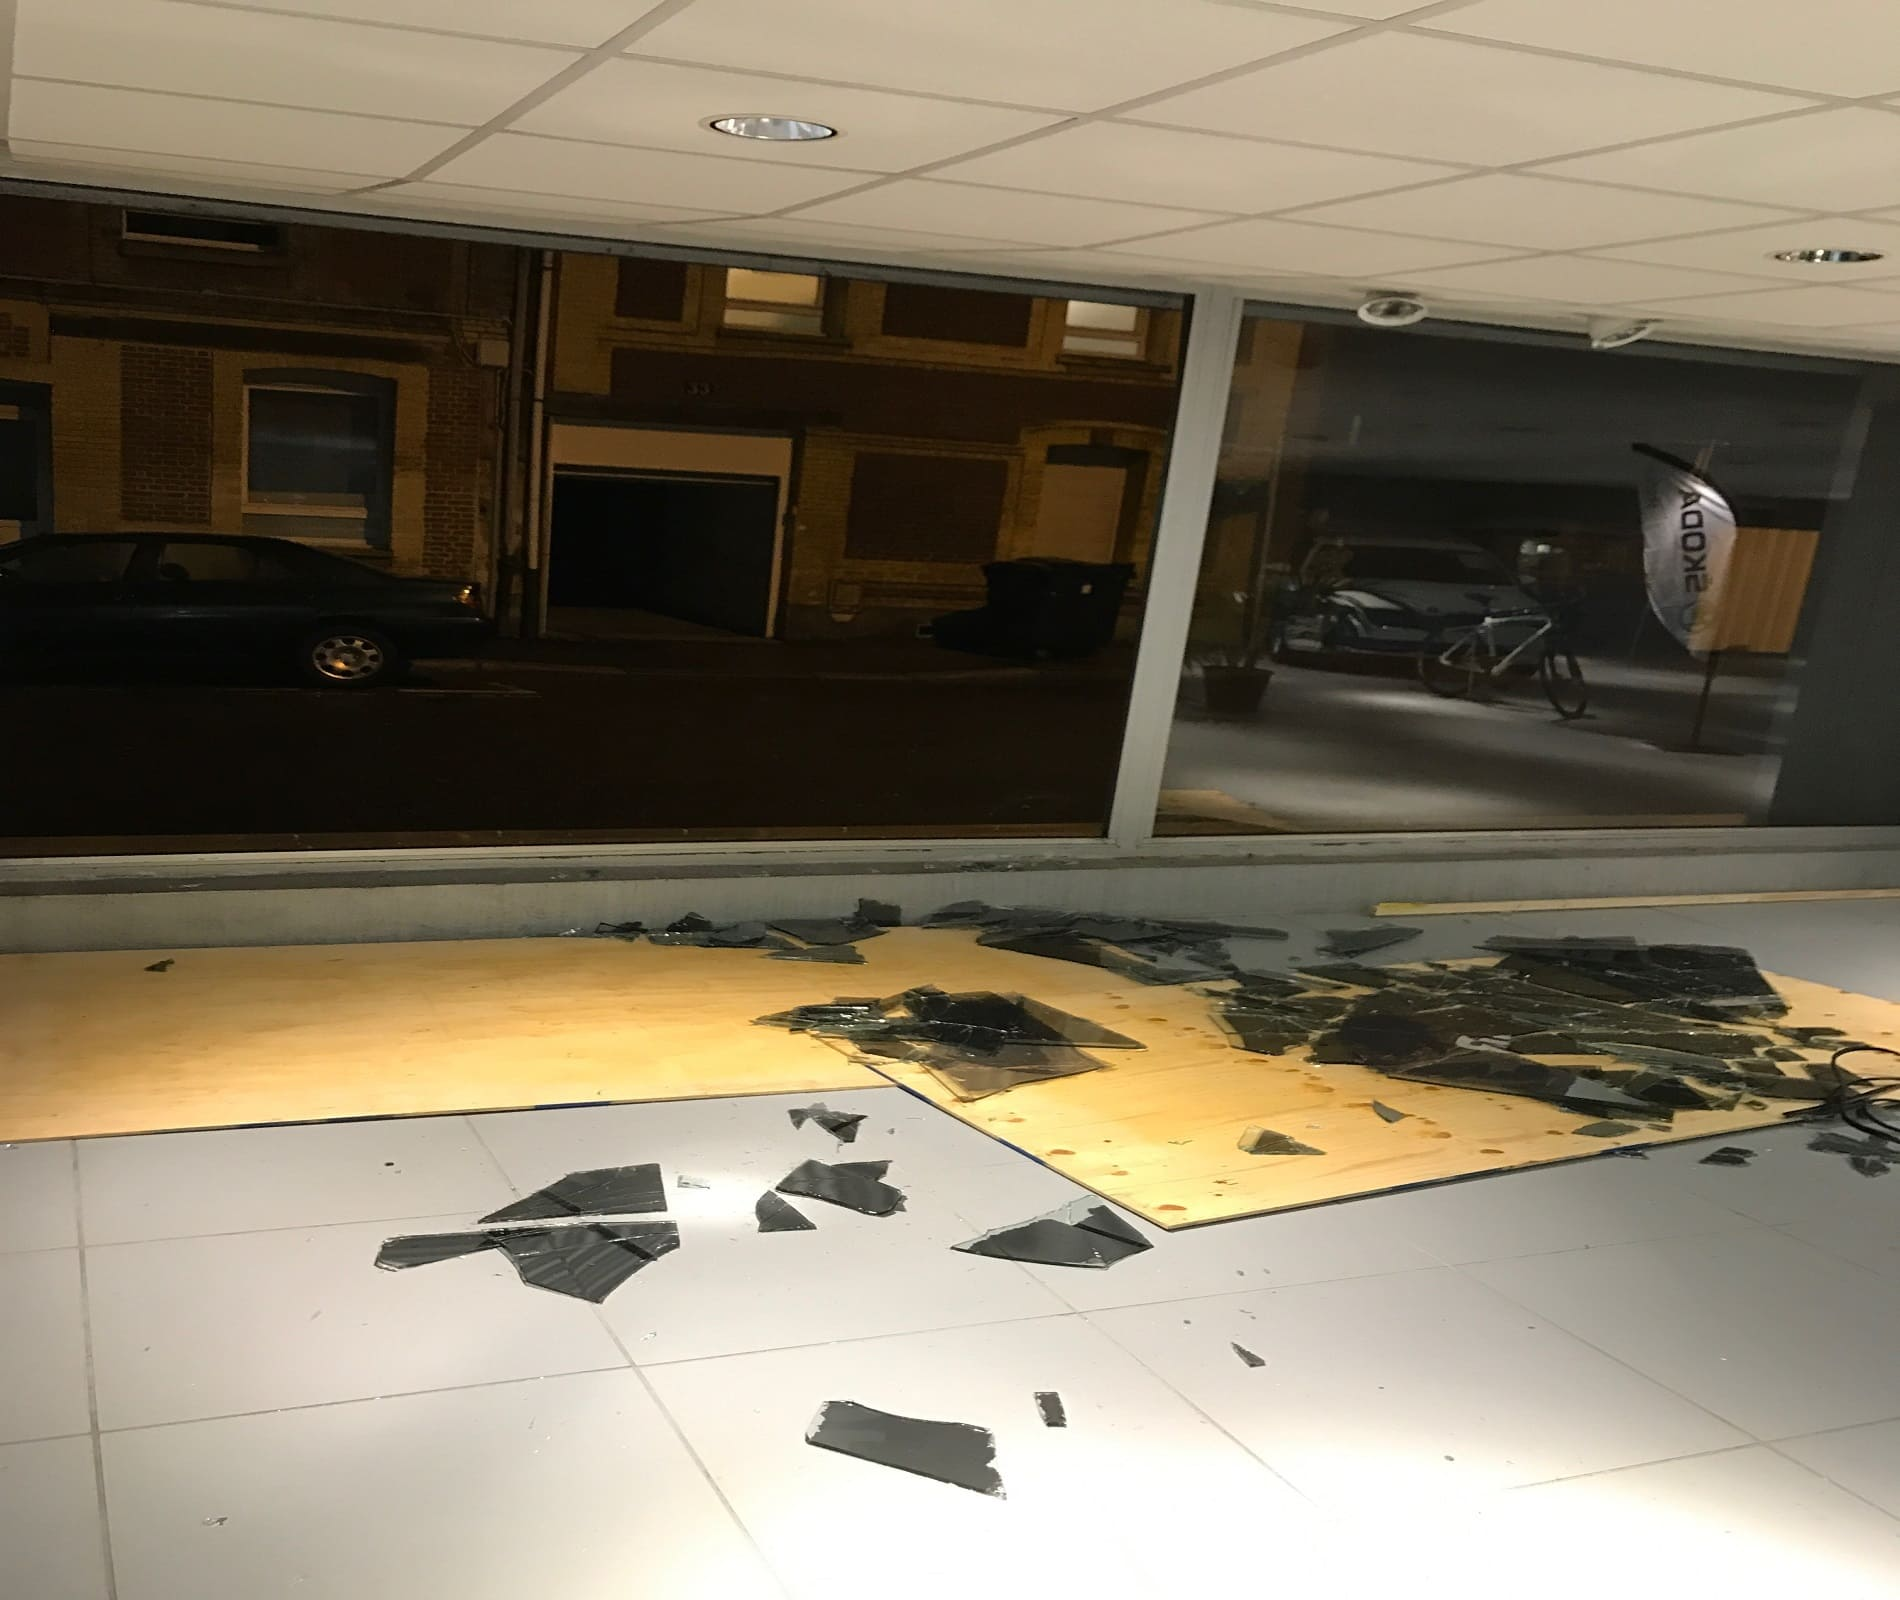 miroiterie ab fermetures Le Havre remplacement vitrine commerce-76600 le havre